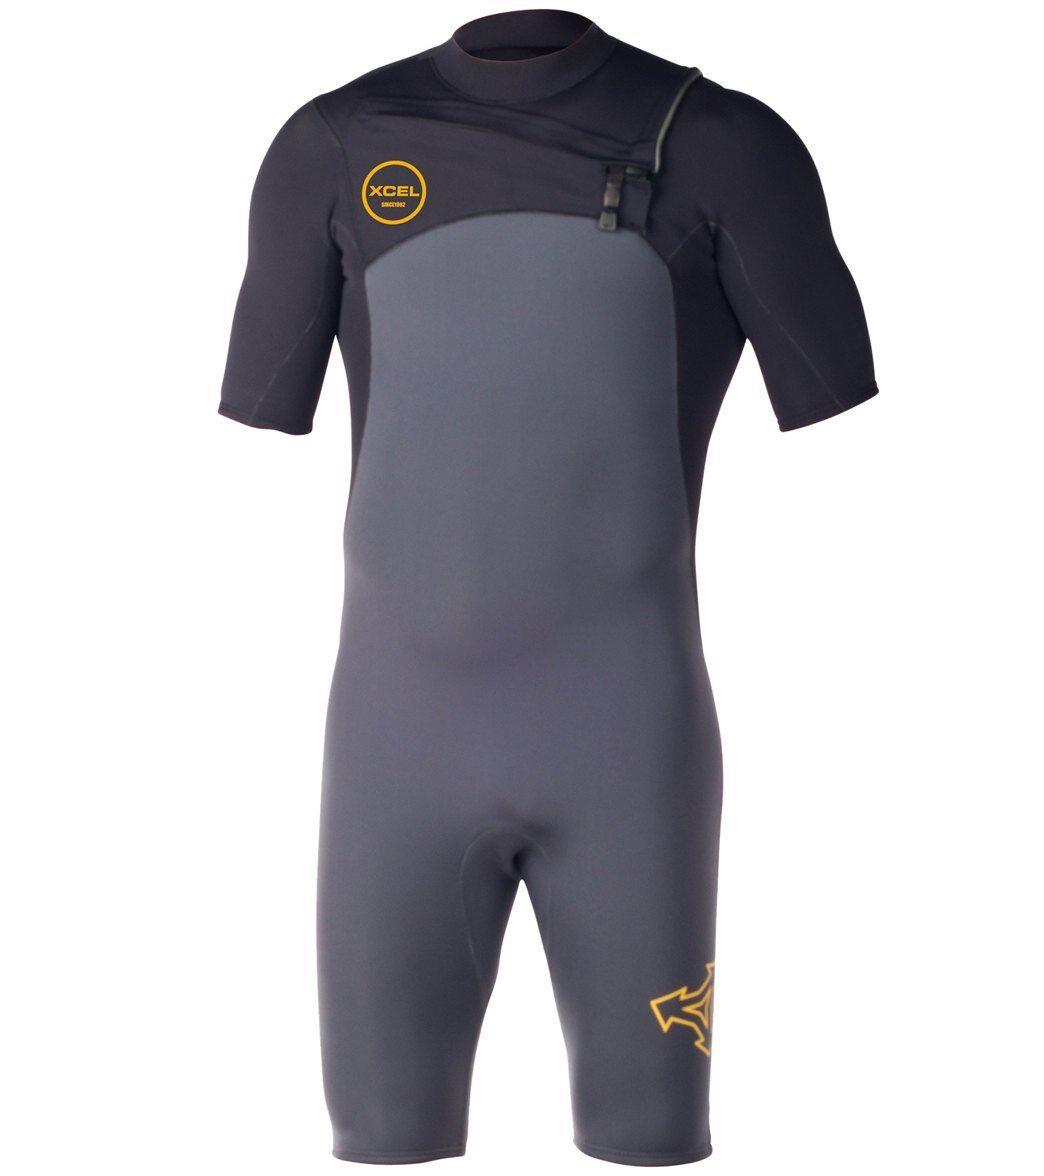 XCEL Men's 2mm INFINITI COMP CZ S S Spring Suit -GUB - Small - NWT LAST ONE LEFT